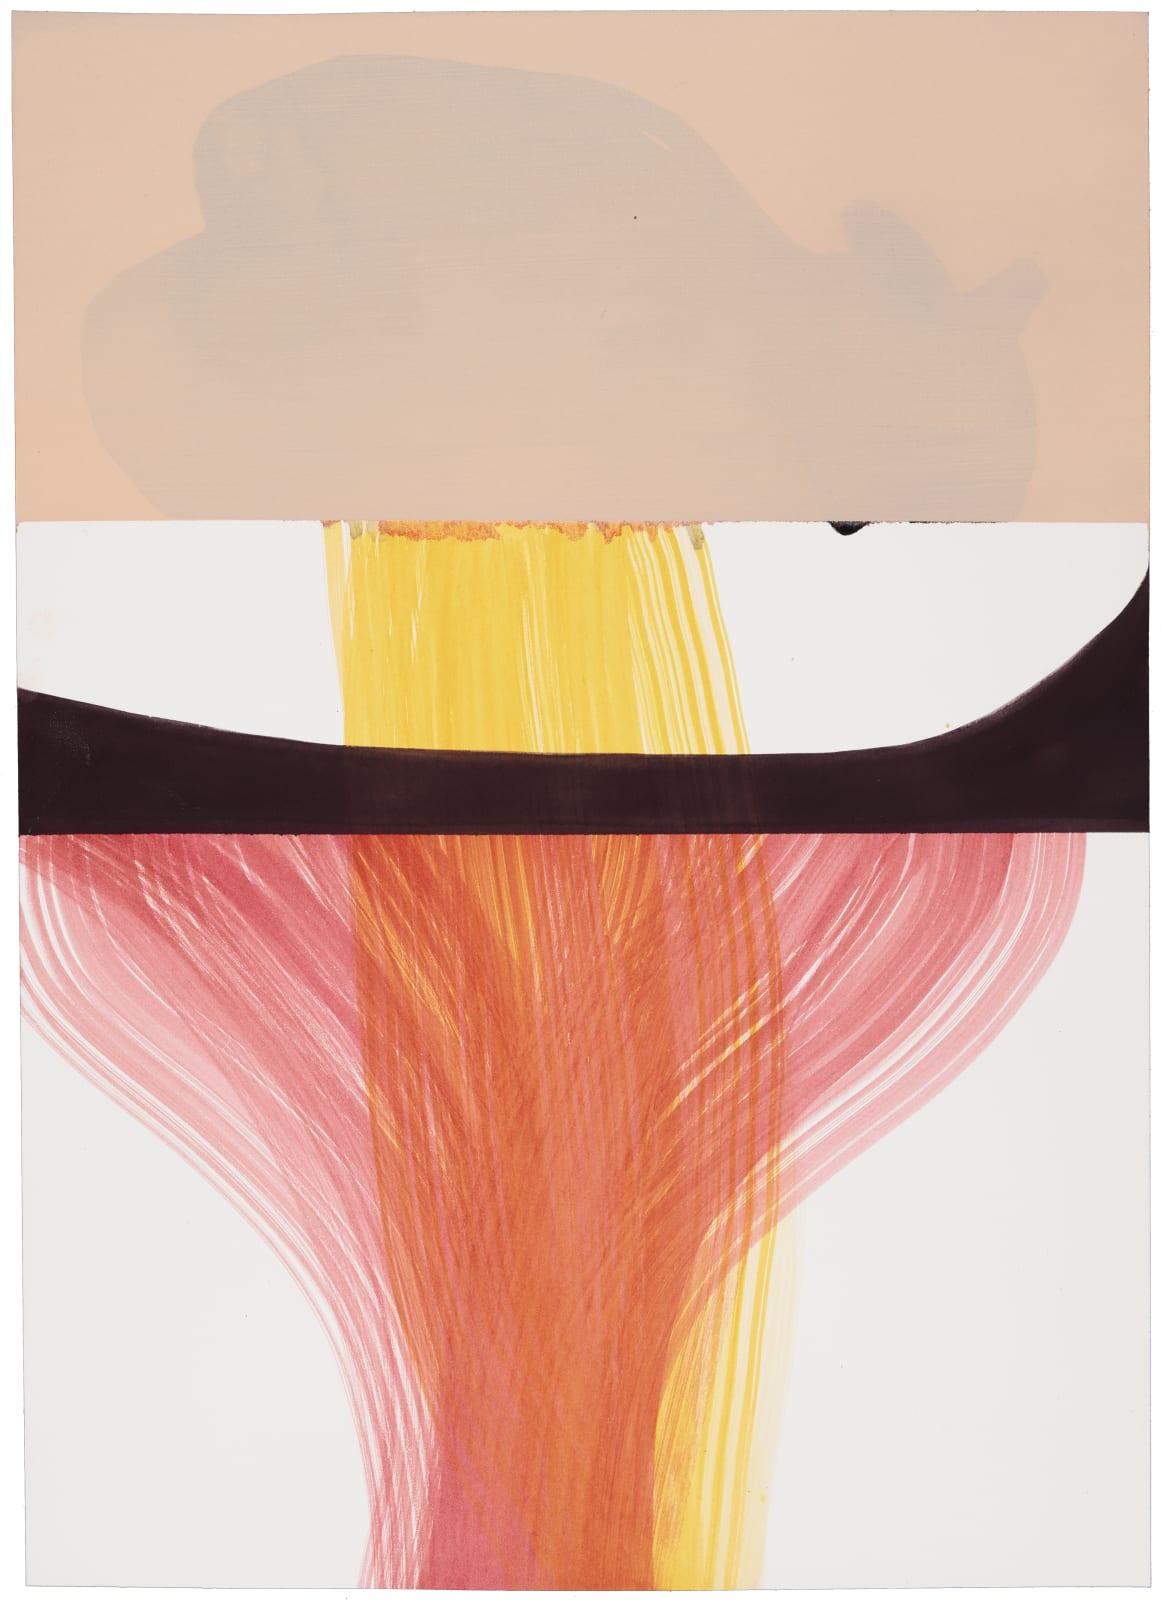 Sarah Hinckley, many things on my mind (1), 2020